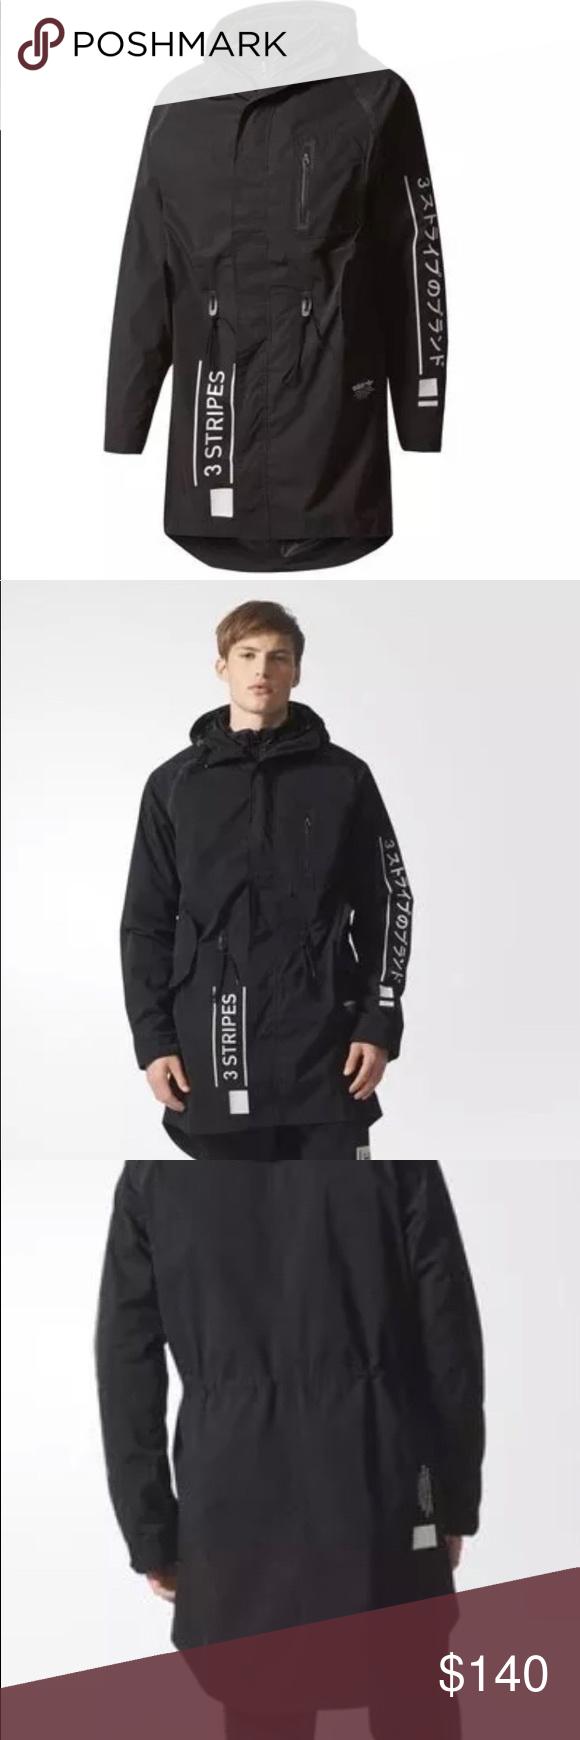 Adidas Originals Nmd Men S Two One Utility Jacket Adidas Originals Nmd Utility Jacket Jackets [ 1740 x 580 Pixel ]